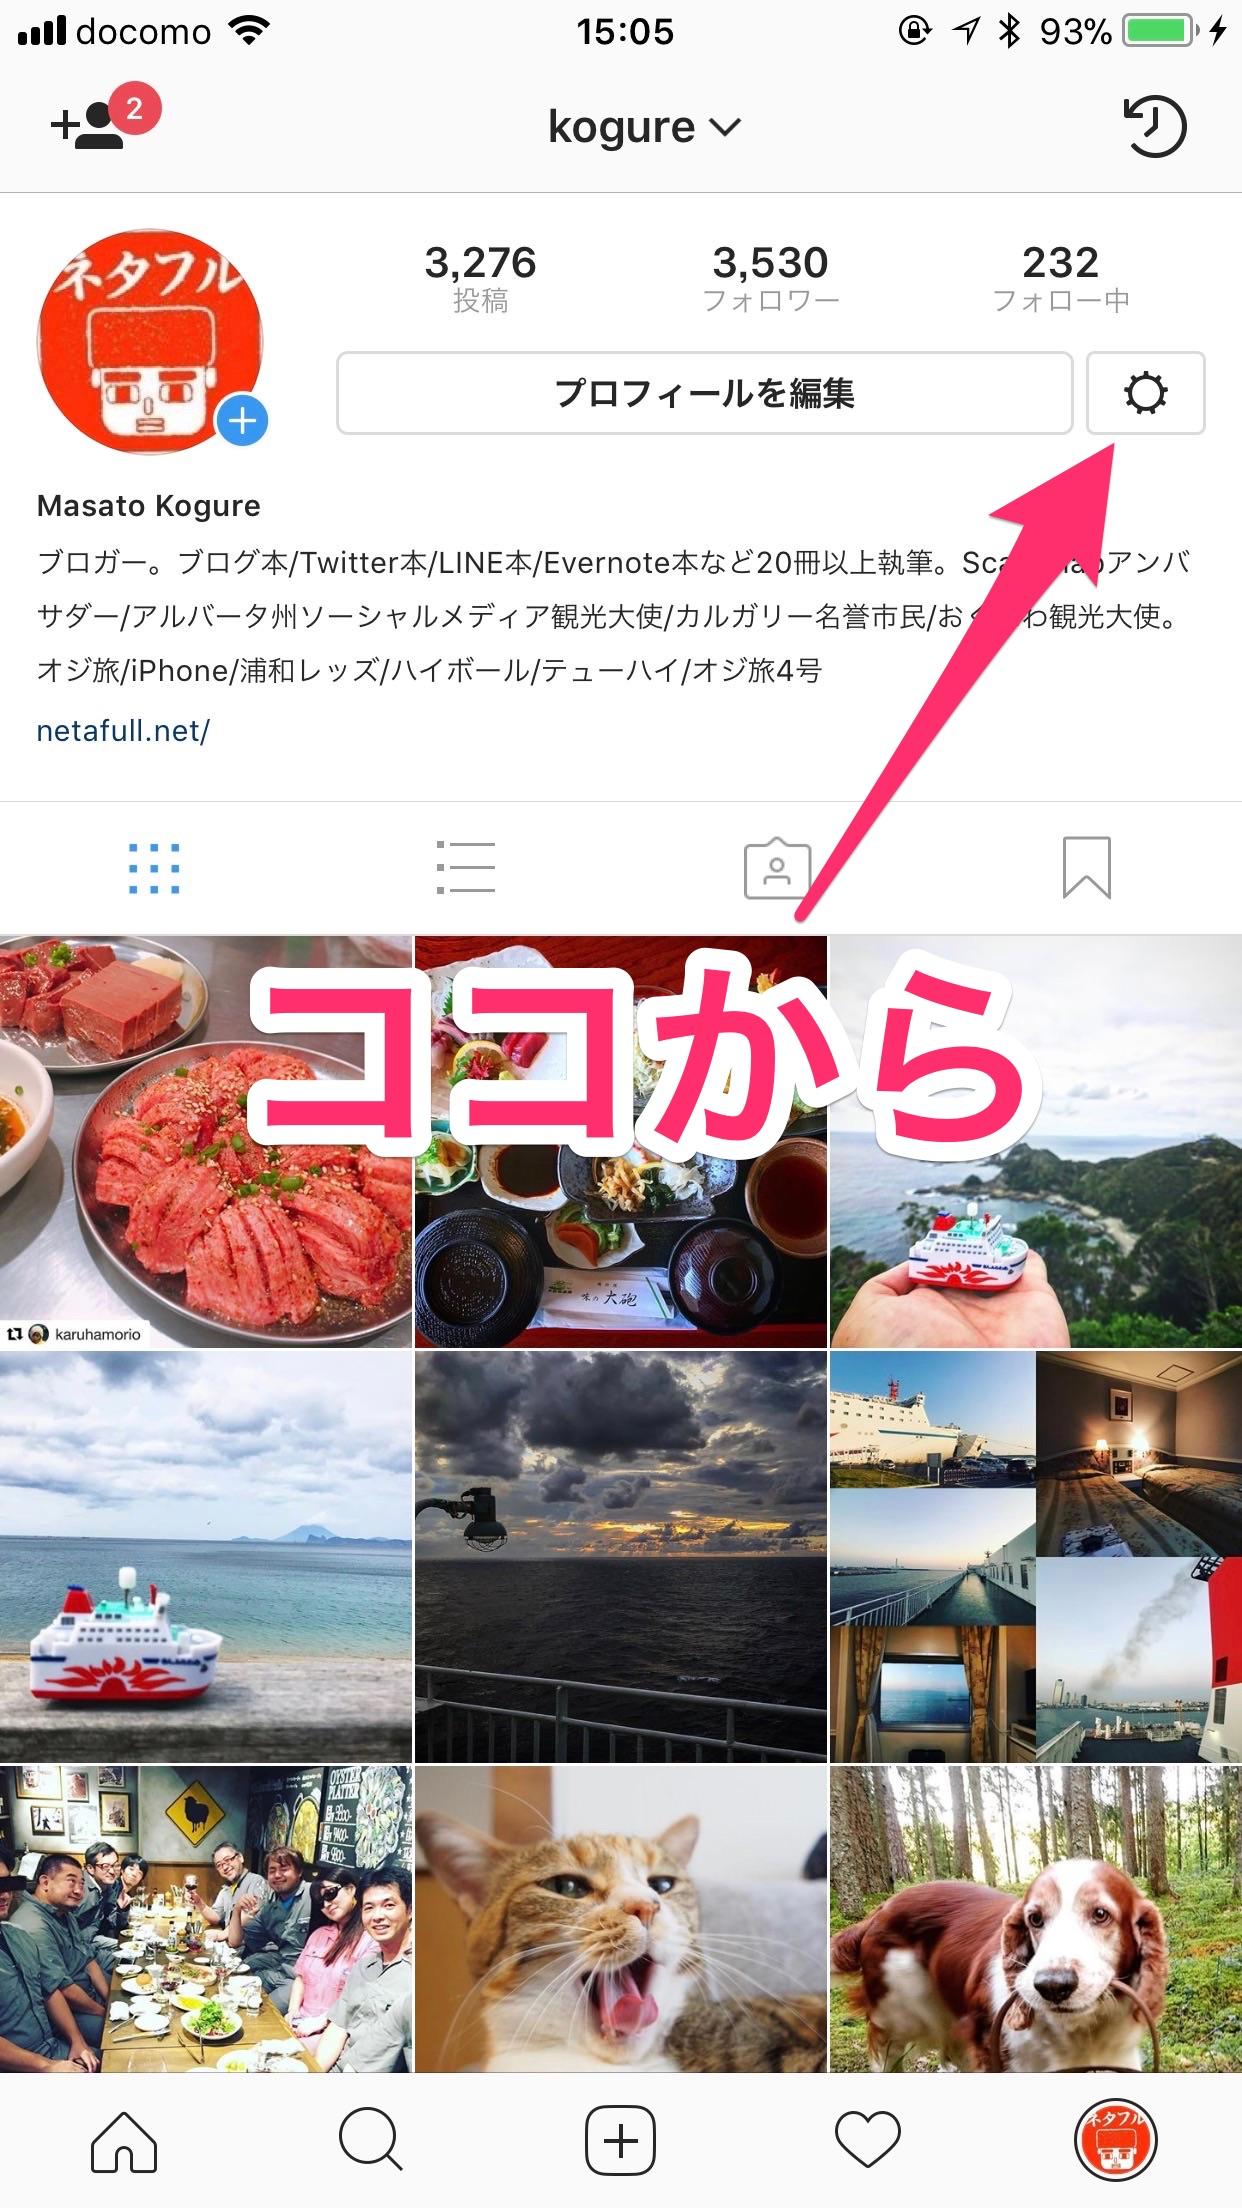 【Instagram】コメントする人の管理が可能に「コメントコントロール」機能